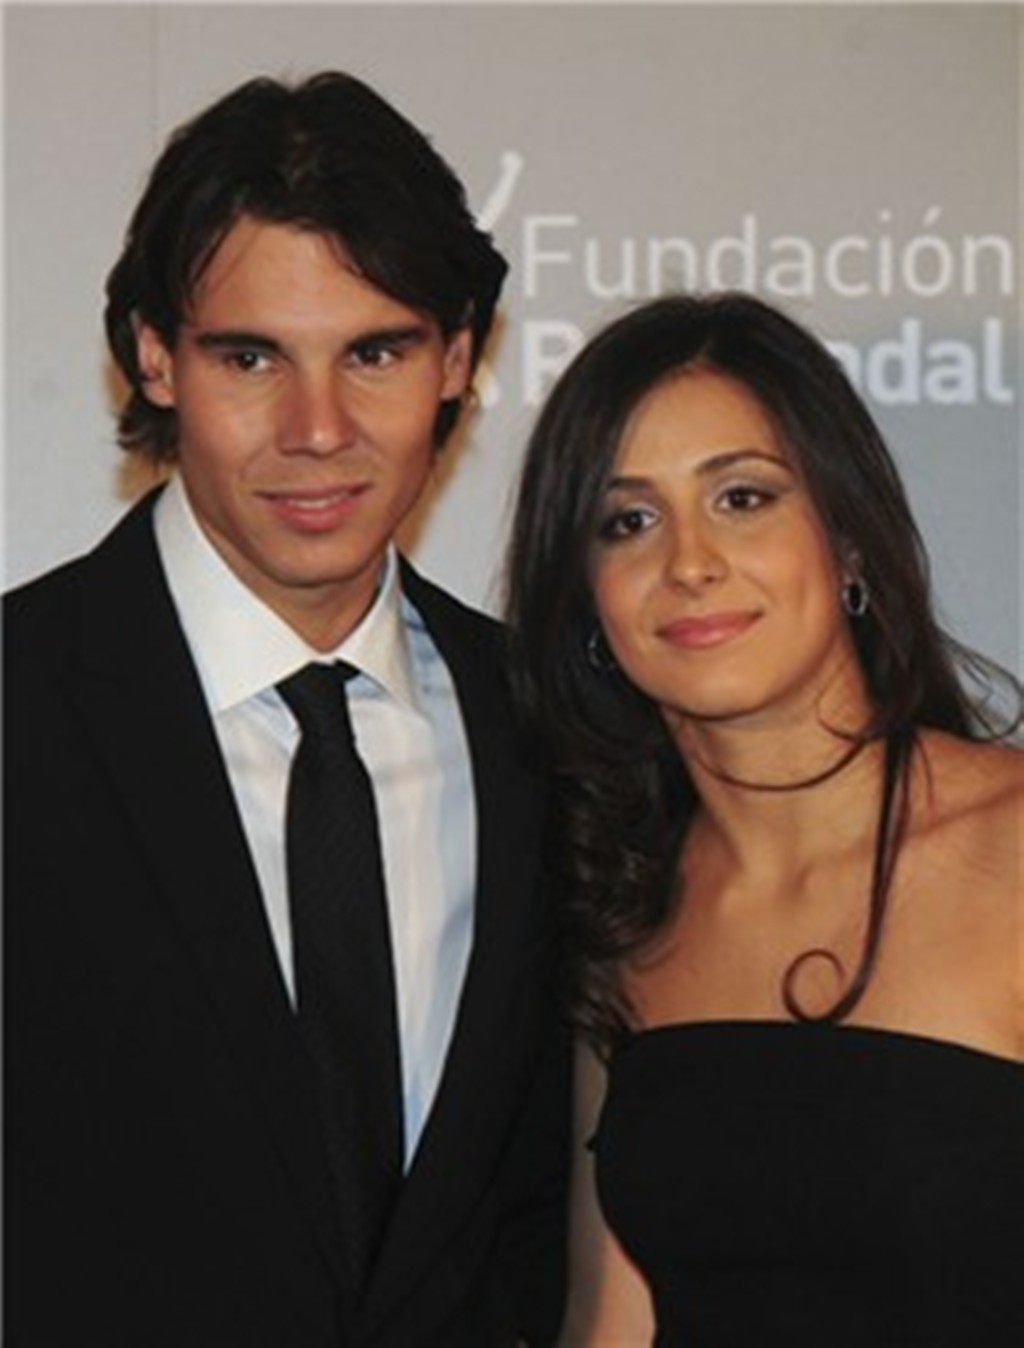 The new look of Xisca Perello, Rafael Nadal's girlfriend